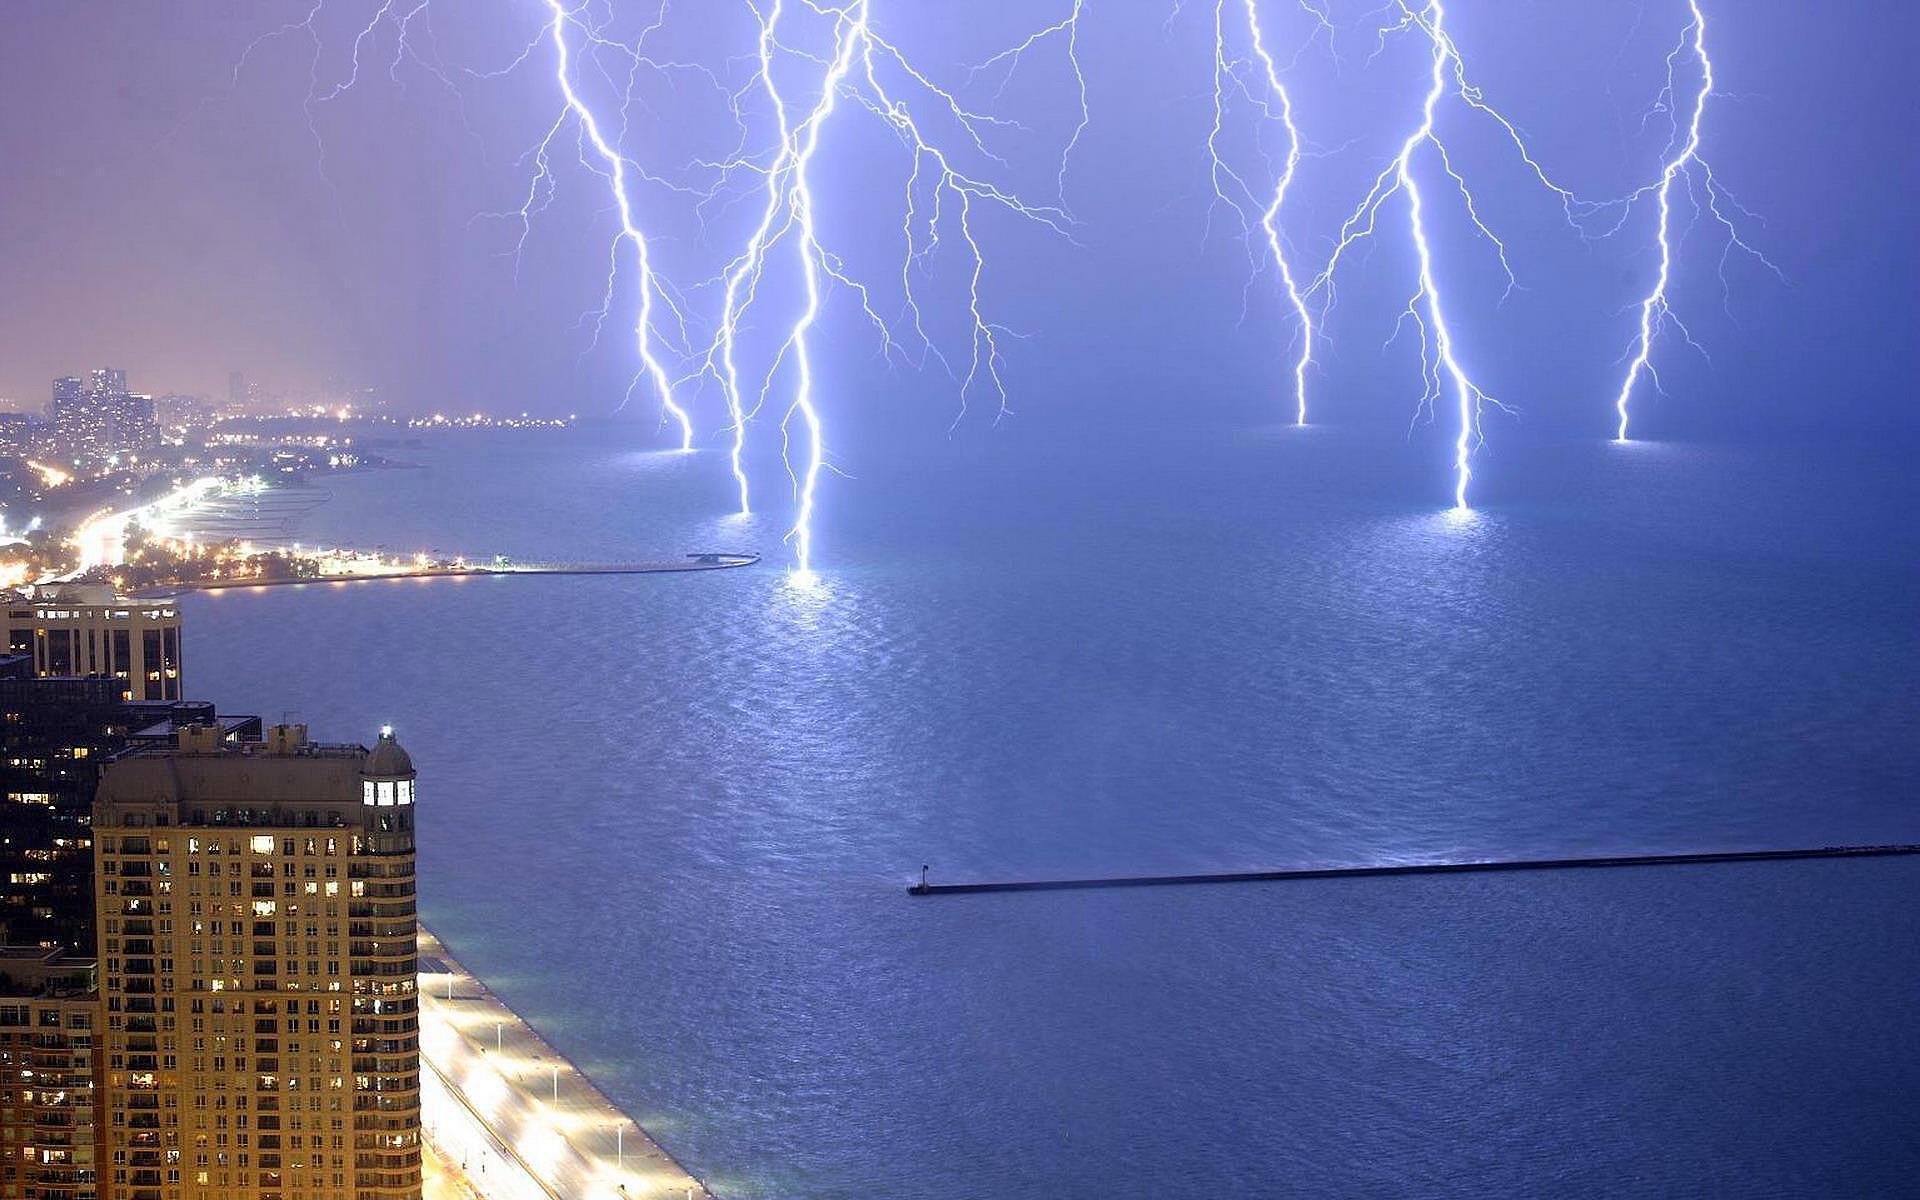 Top 4 Lightning Network Exchanges - via Wallpapercave